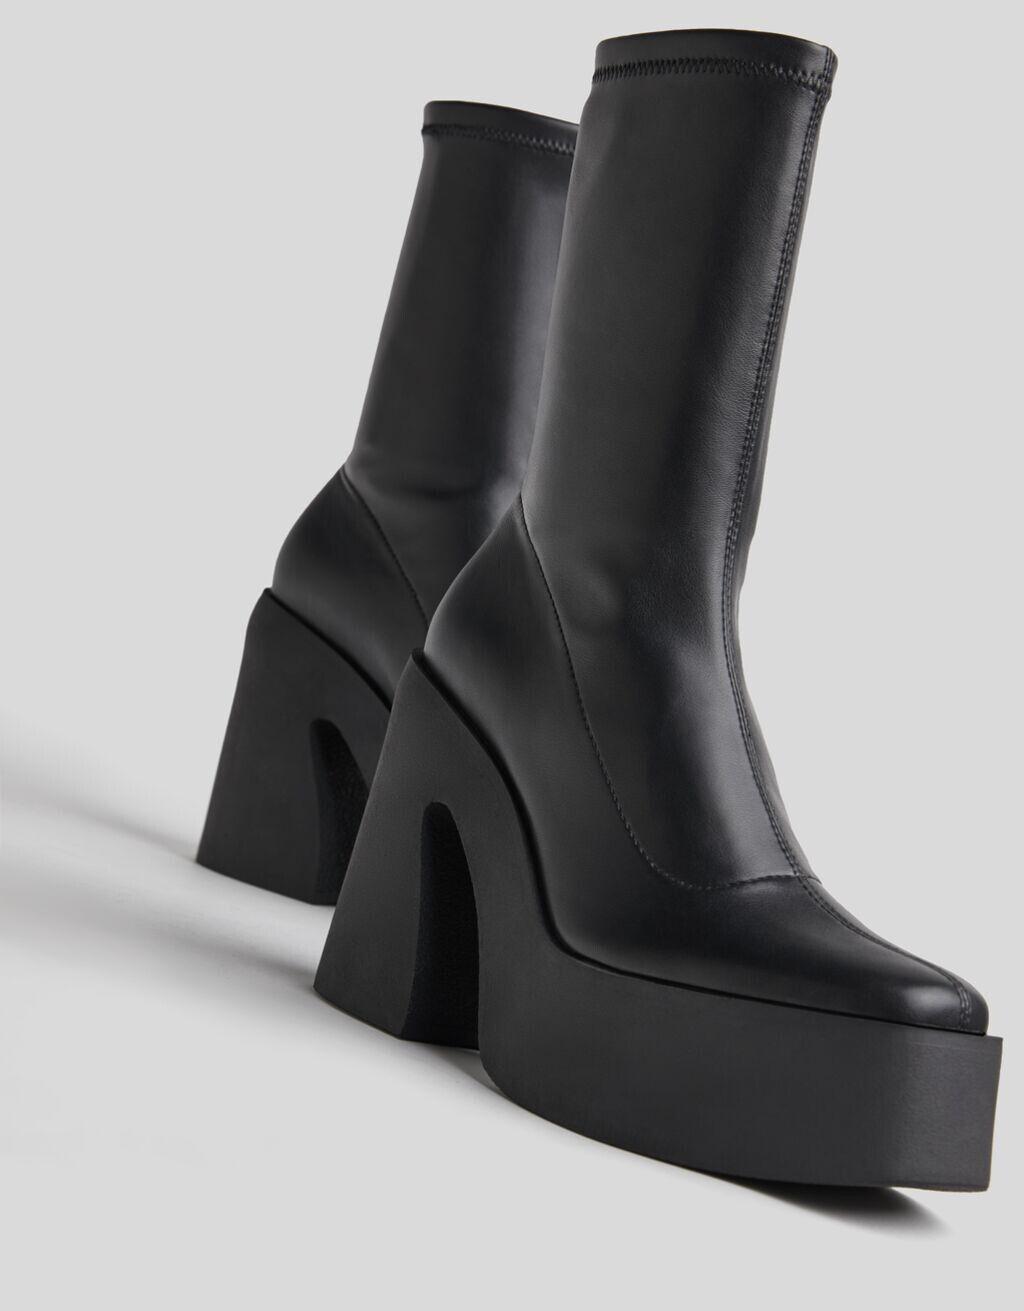 As botas plataforma Bershka que inundam as redes imitam as de Versace